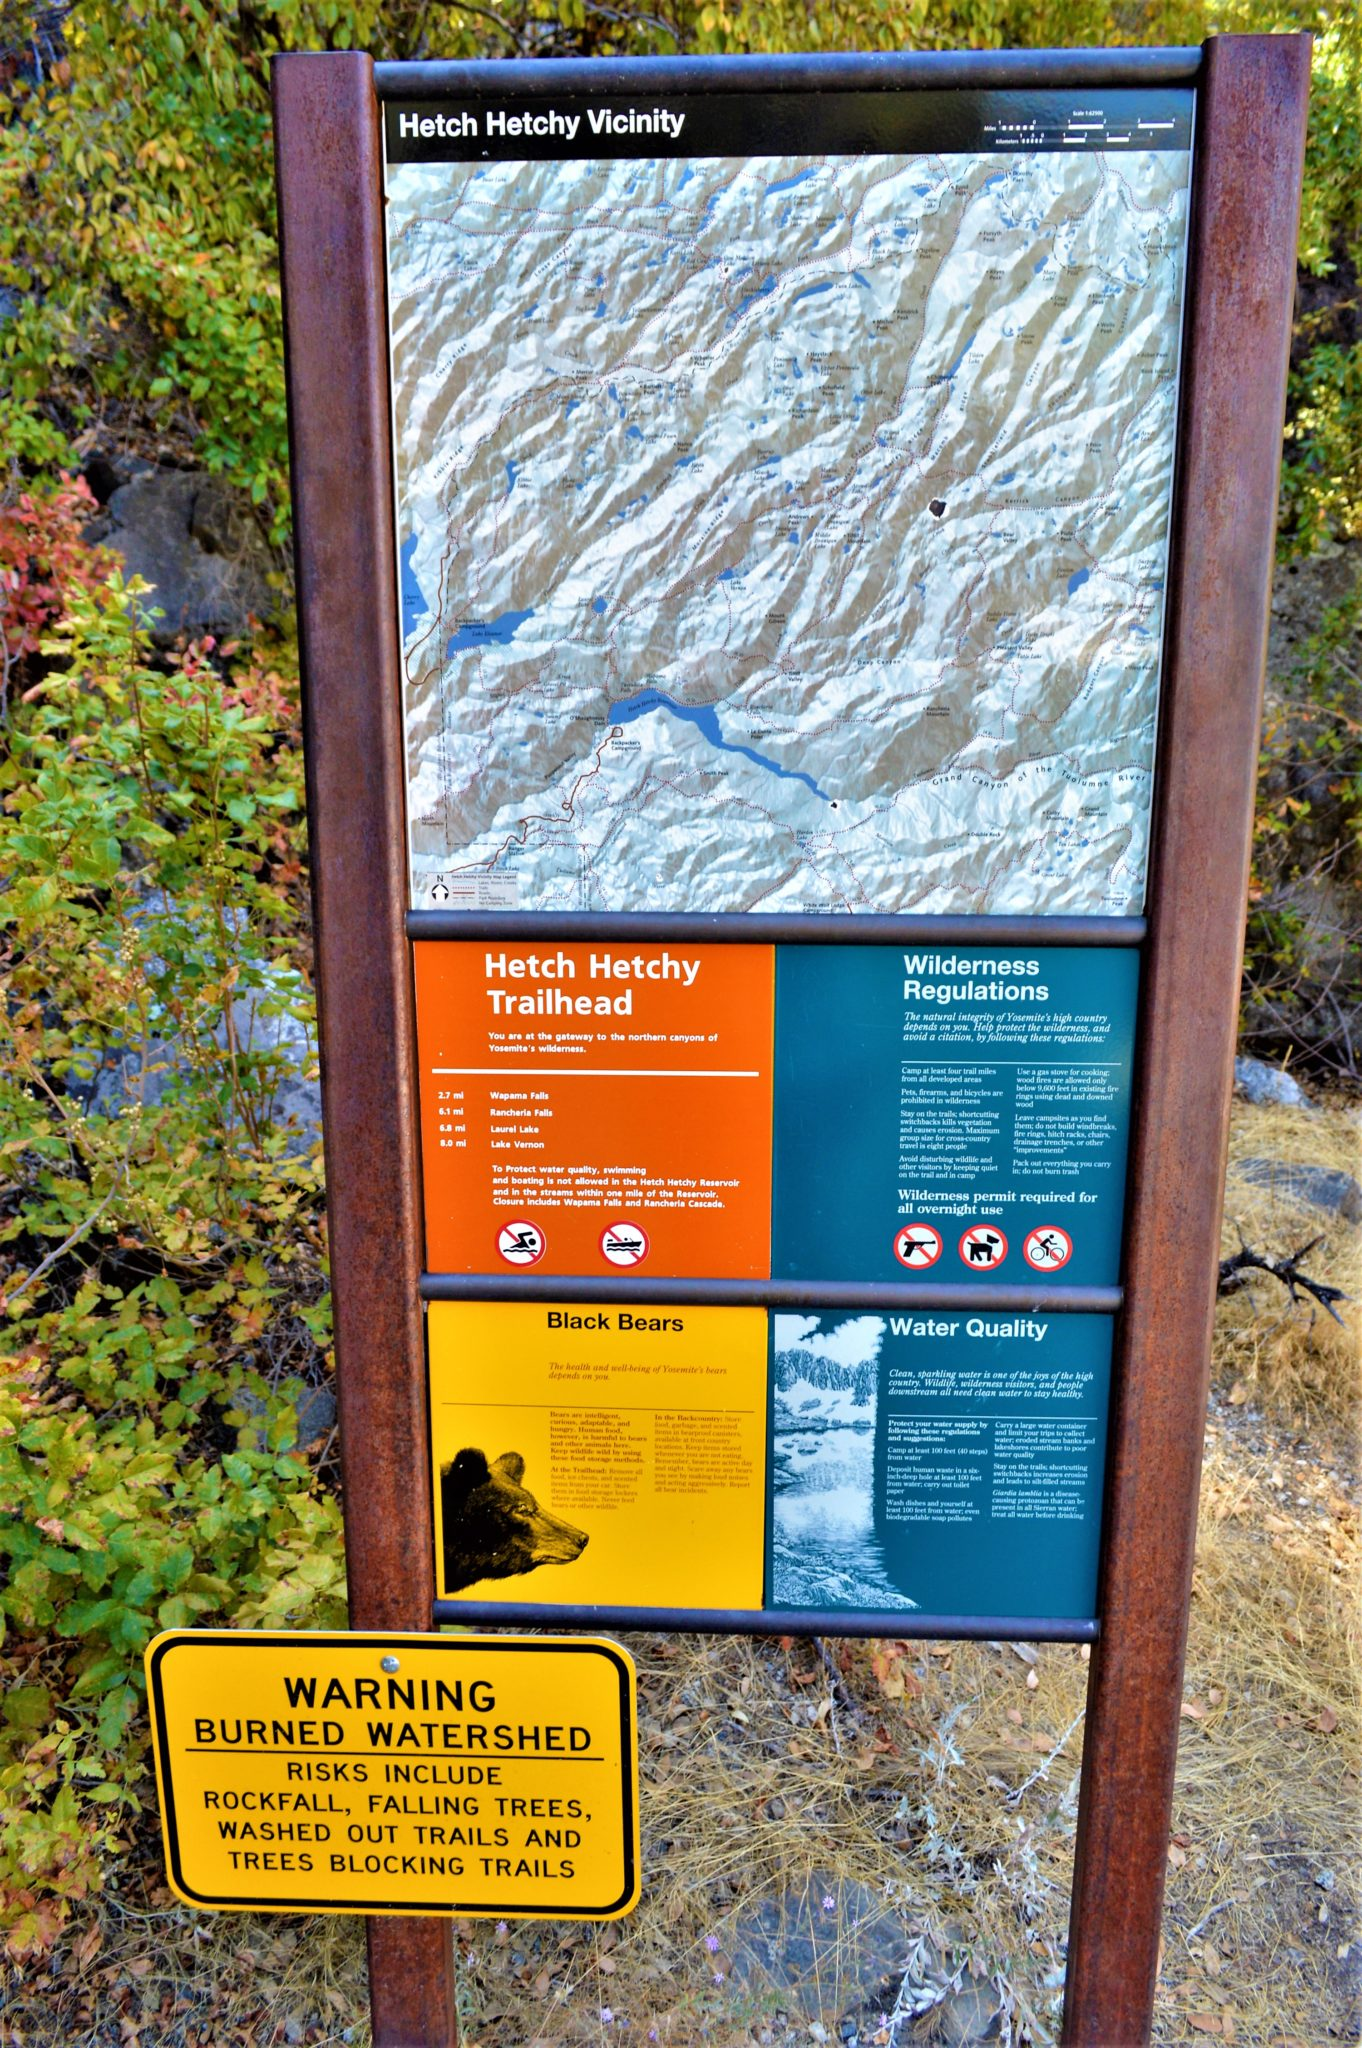 Hetch Hetchy trail head sign, California